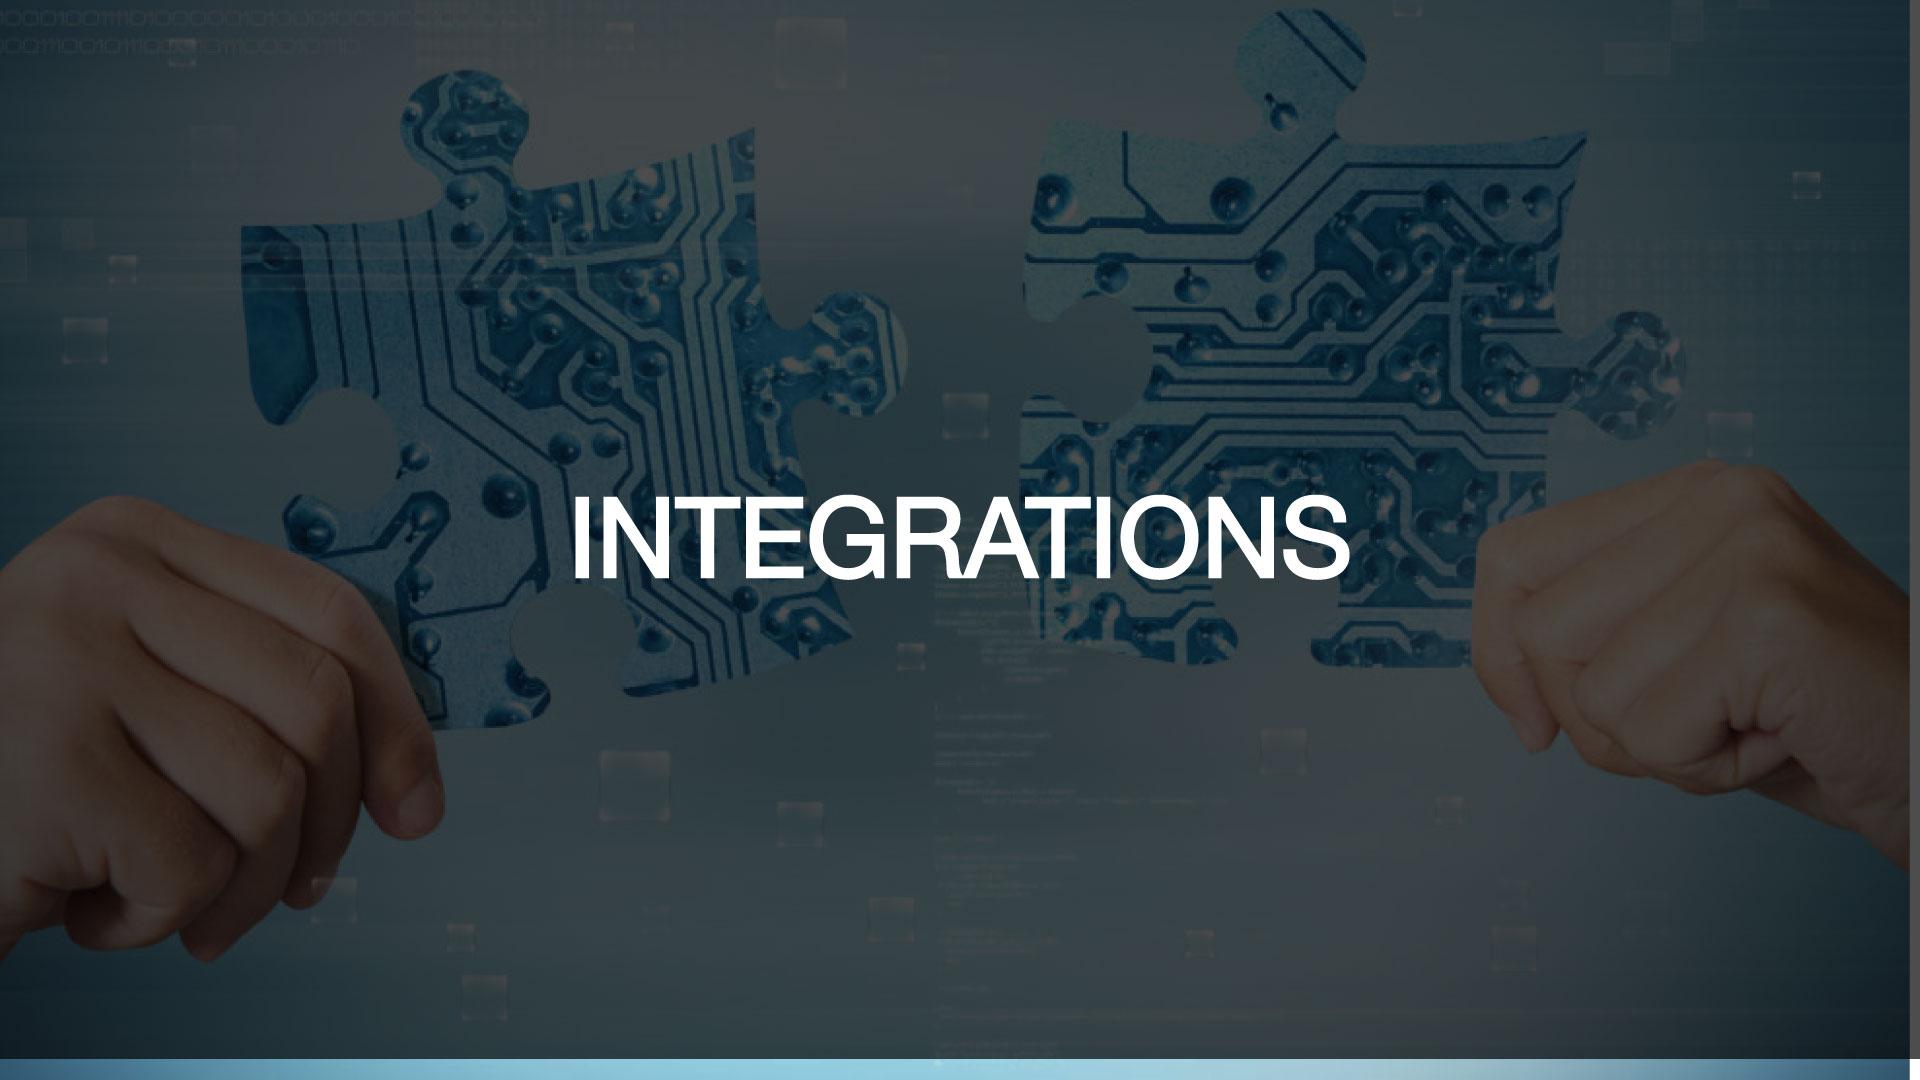 INTEGRATIONS-BANNER